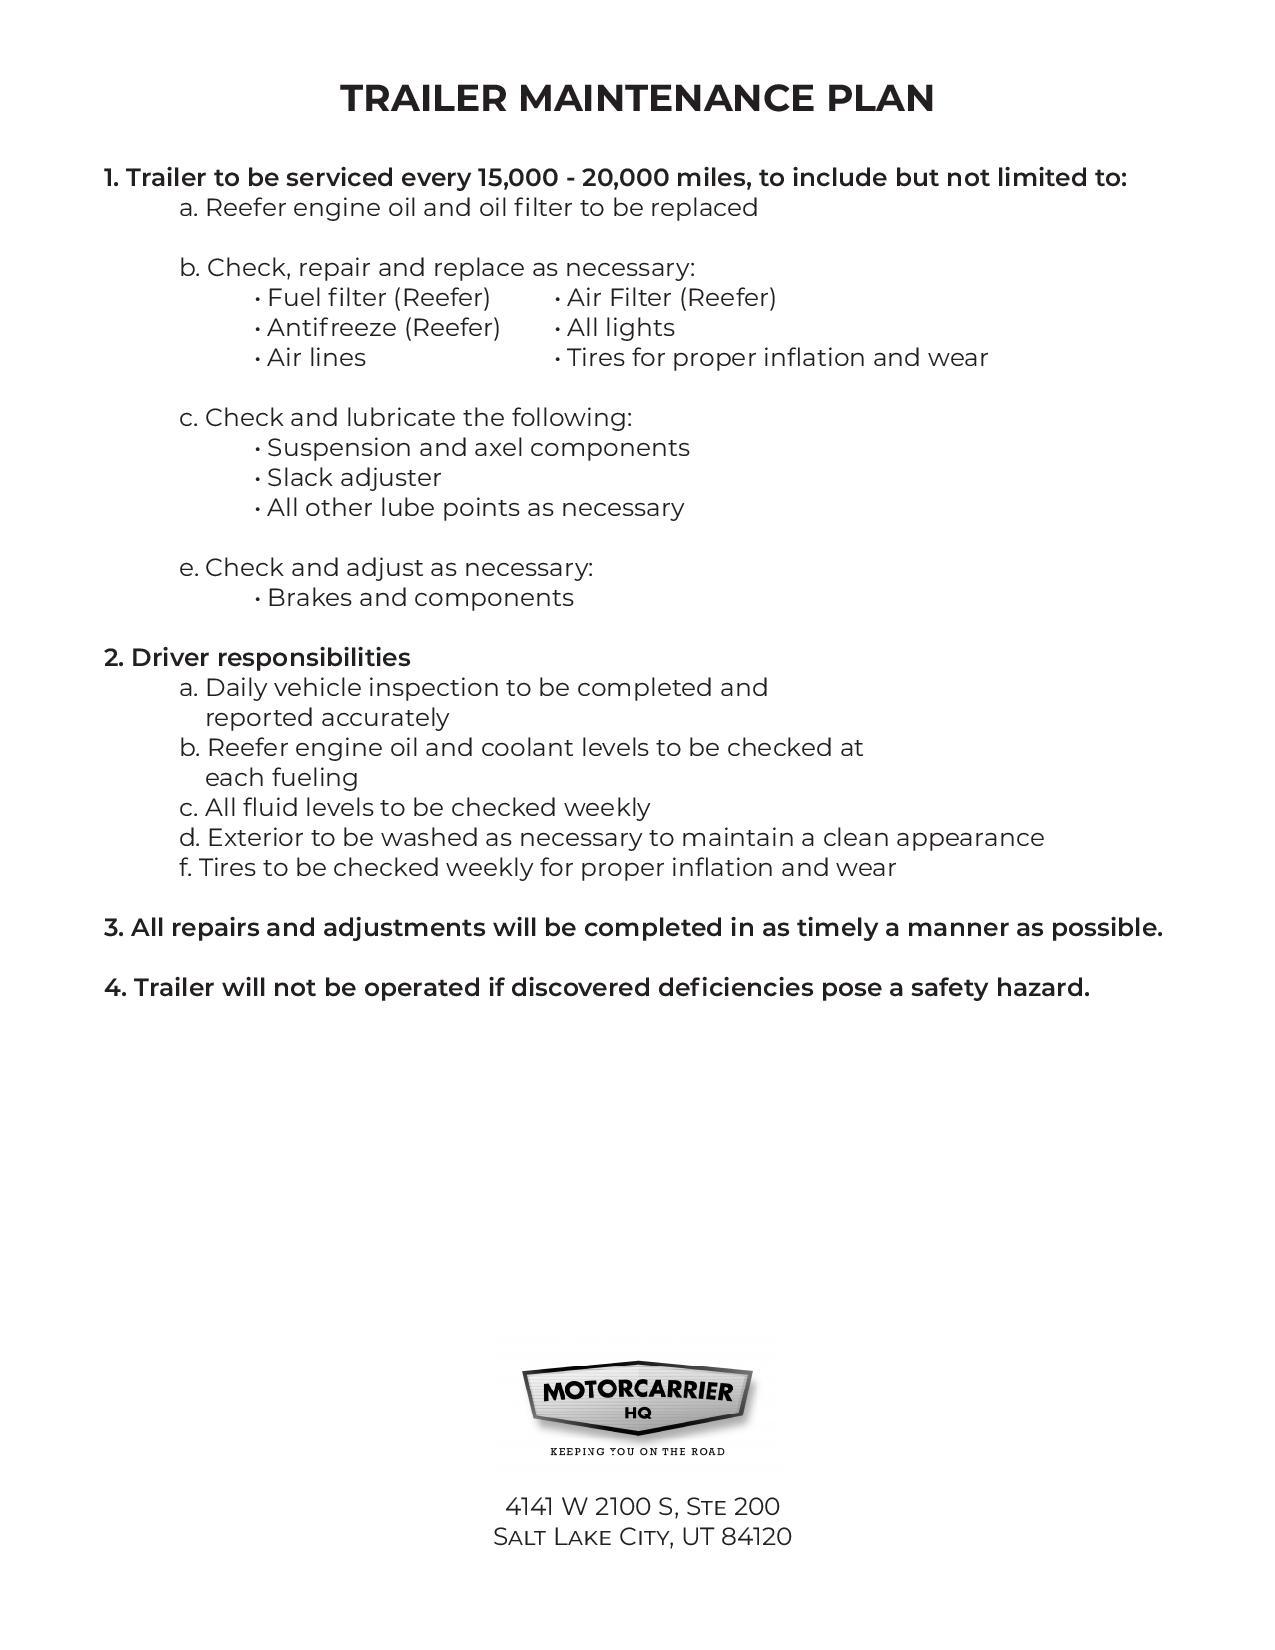 Trailer maintenance plan page.